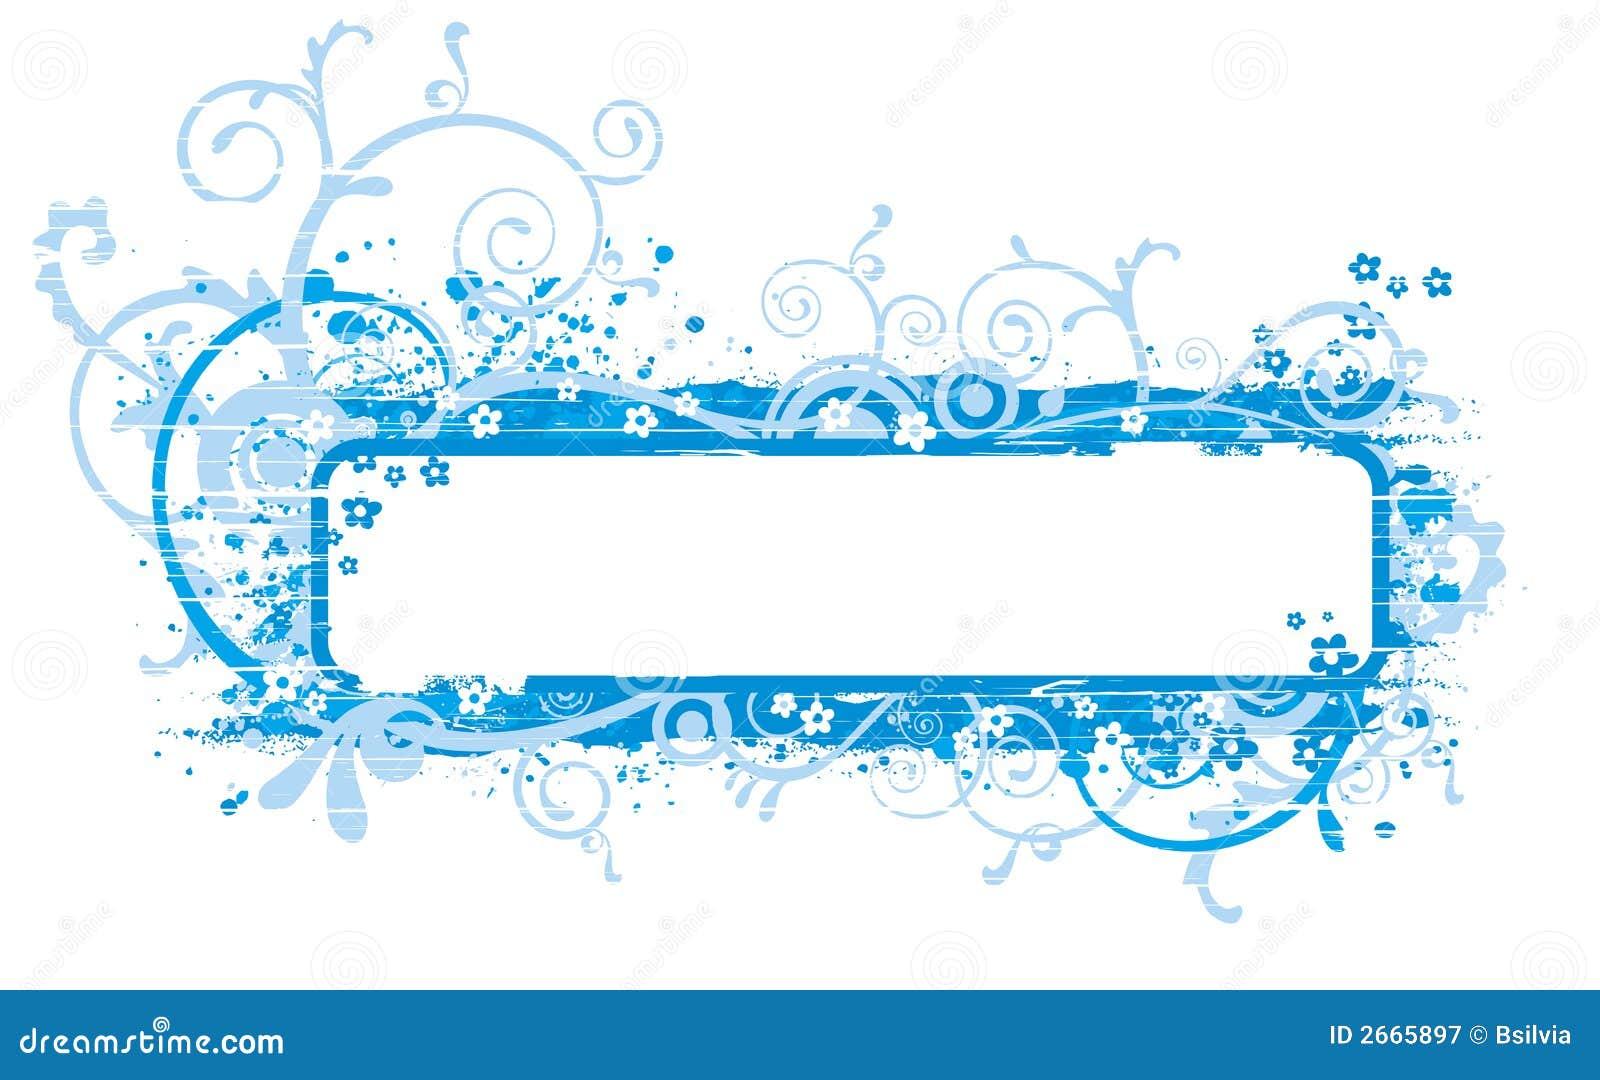 Blue Banner Illustration Royalty Free Stock Images - Image: 3700279